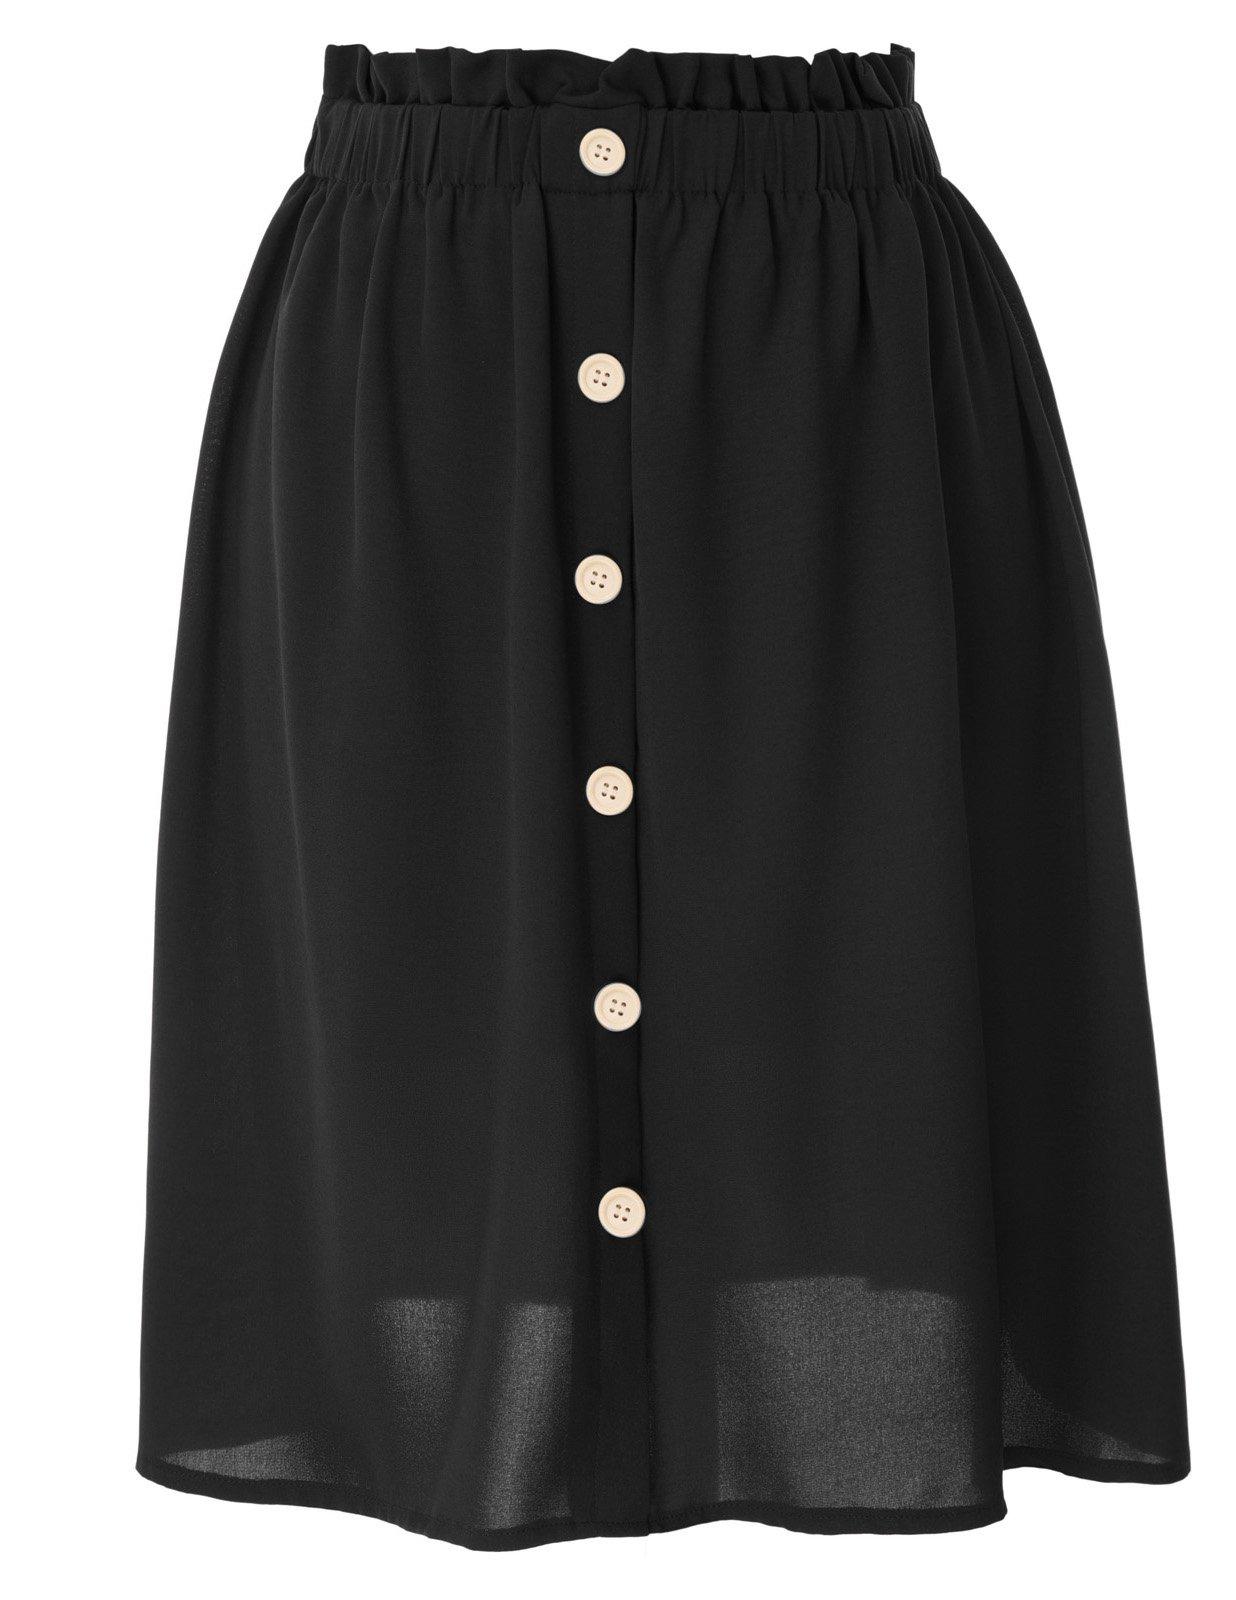 Women's Summer High Waist A-Line Knee Length Skirt for Office Work Black M